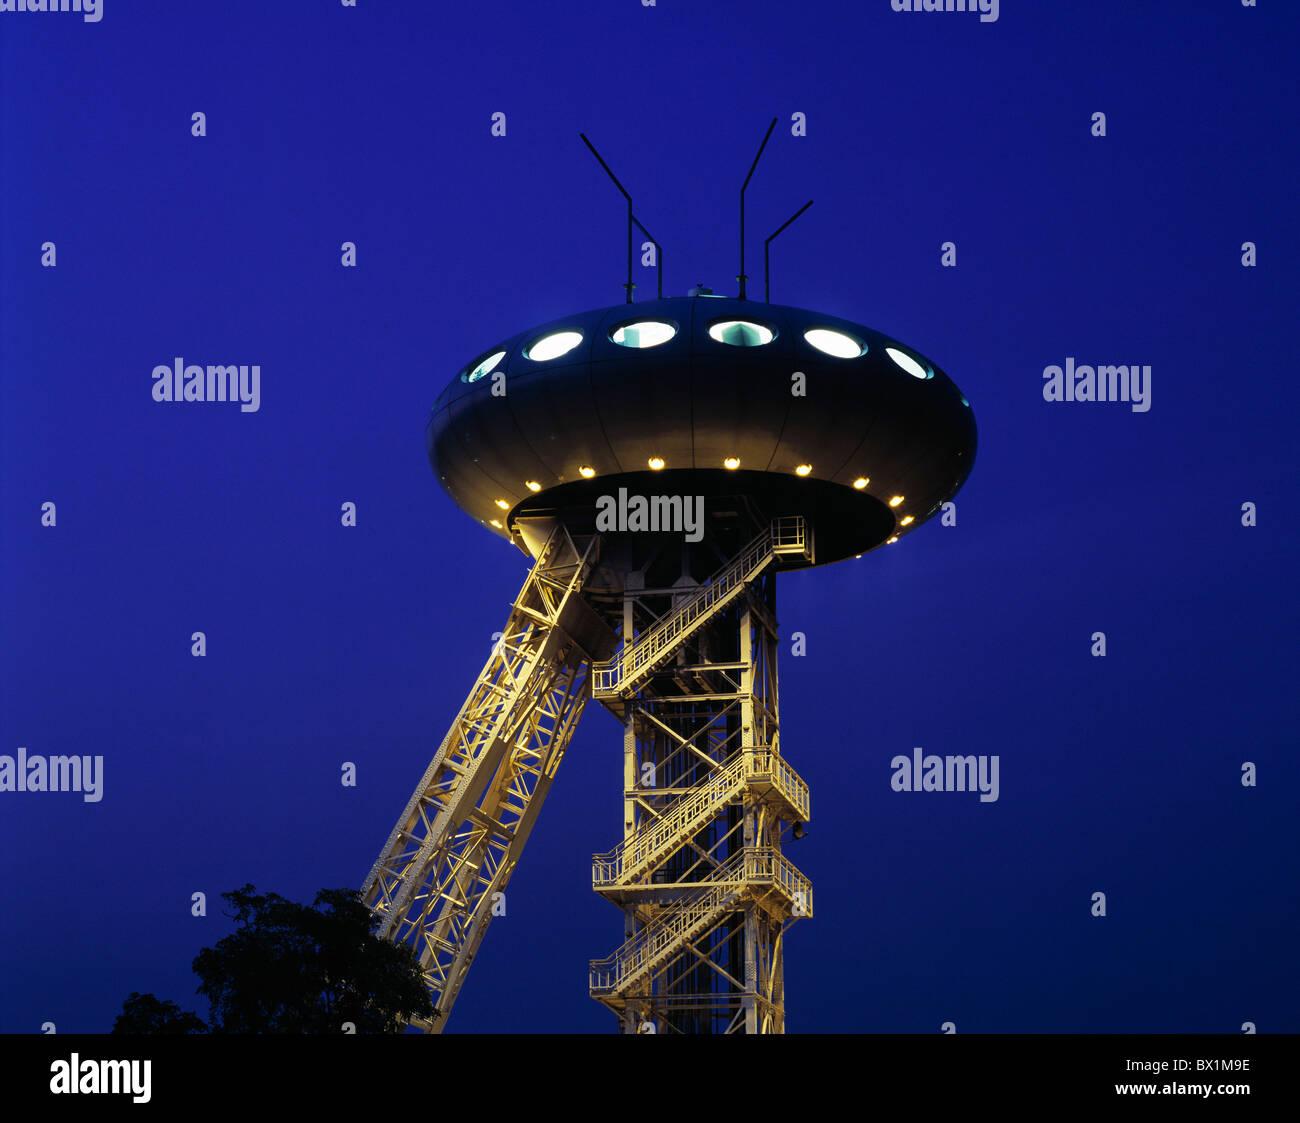 Torre de transportador Europa Alemania IBA Luigi Colani Design Lunen noche Renania del Norte Westfalia investigación Imagen De Stock